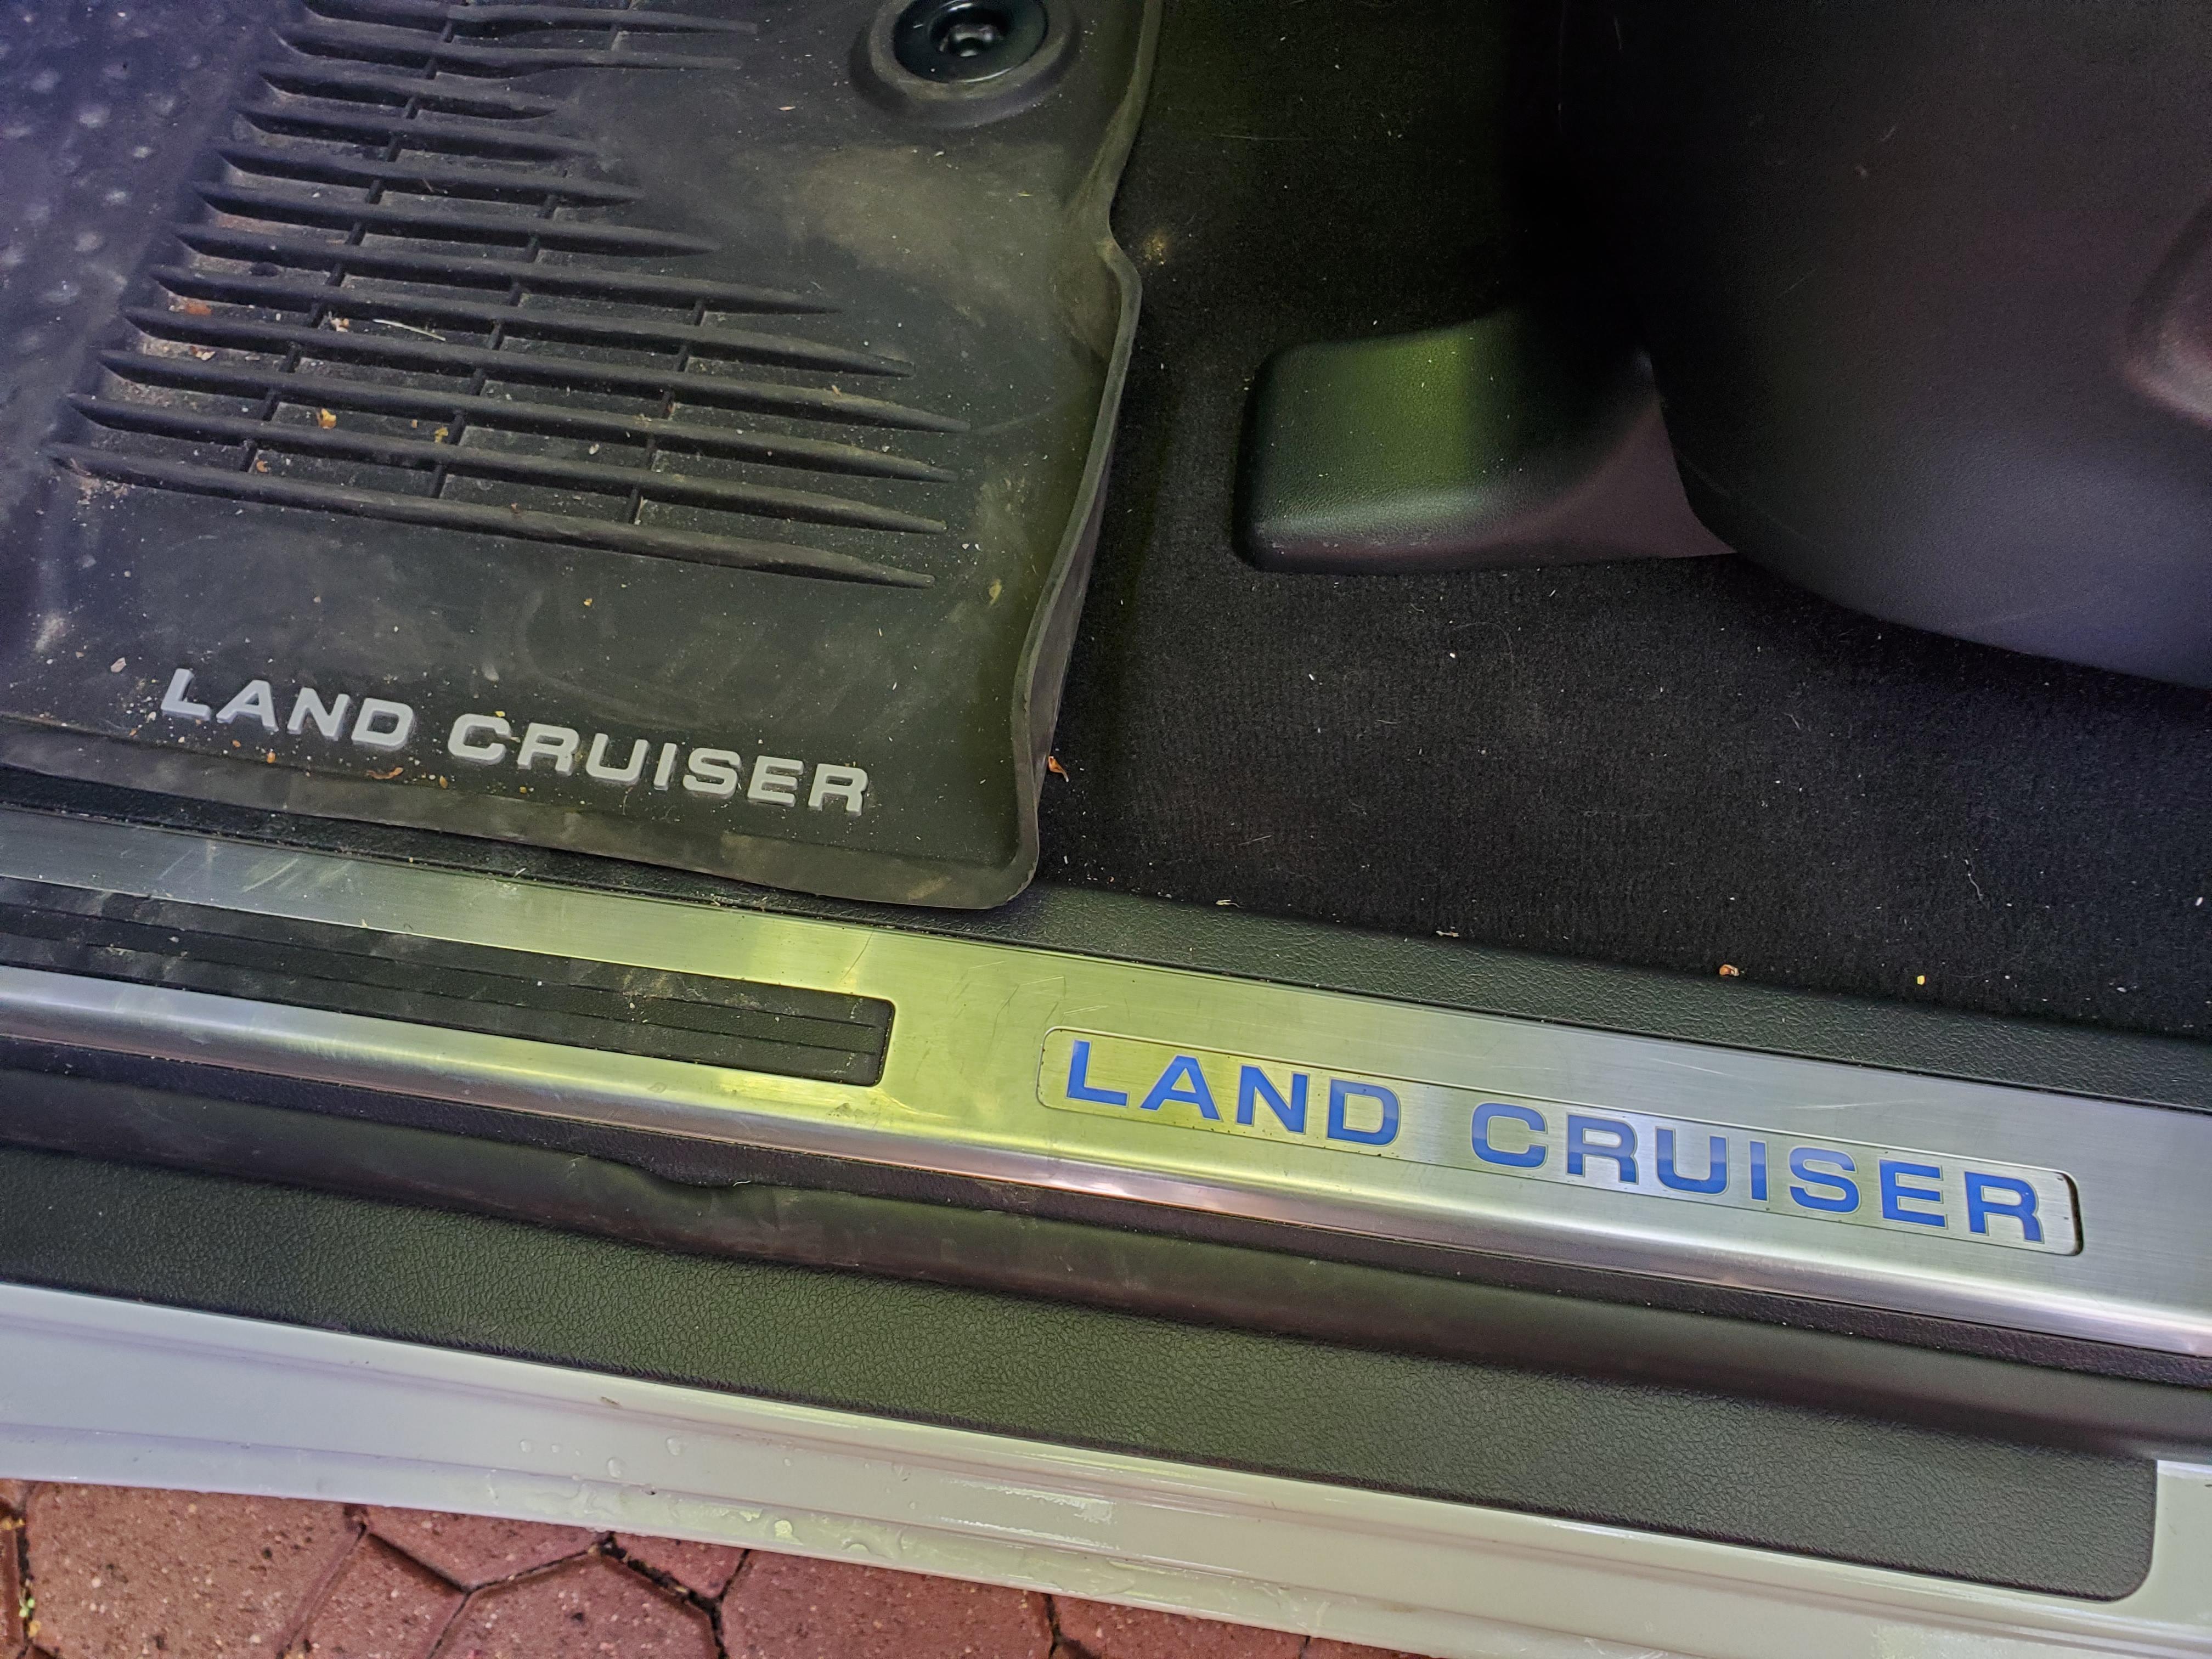 Land Cruiser Logos on the door sills